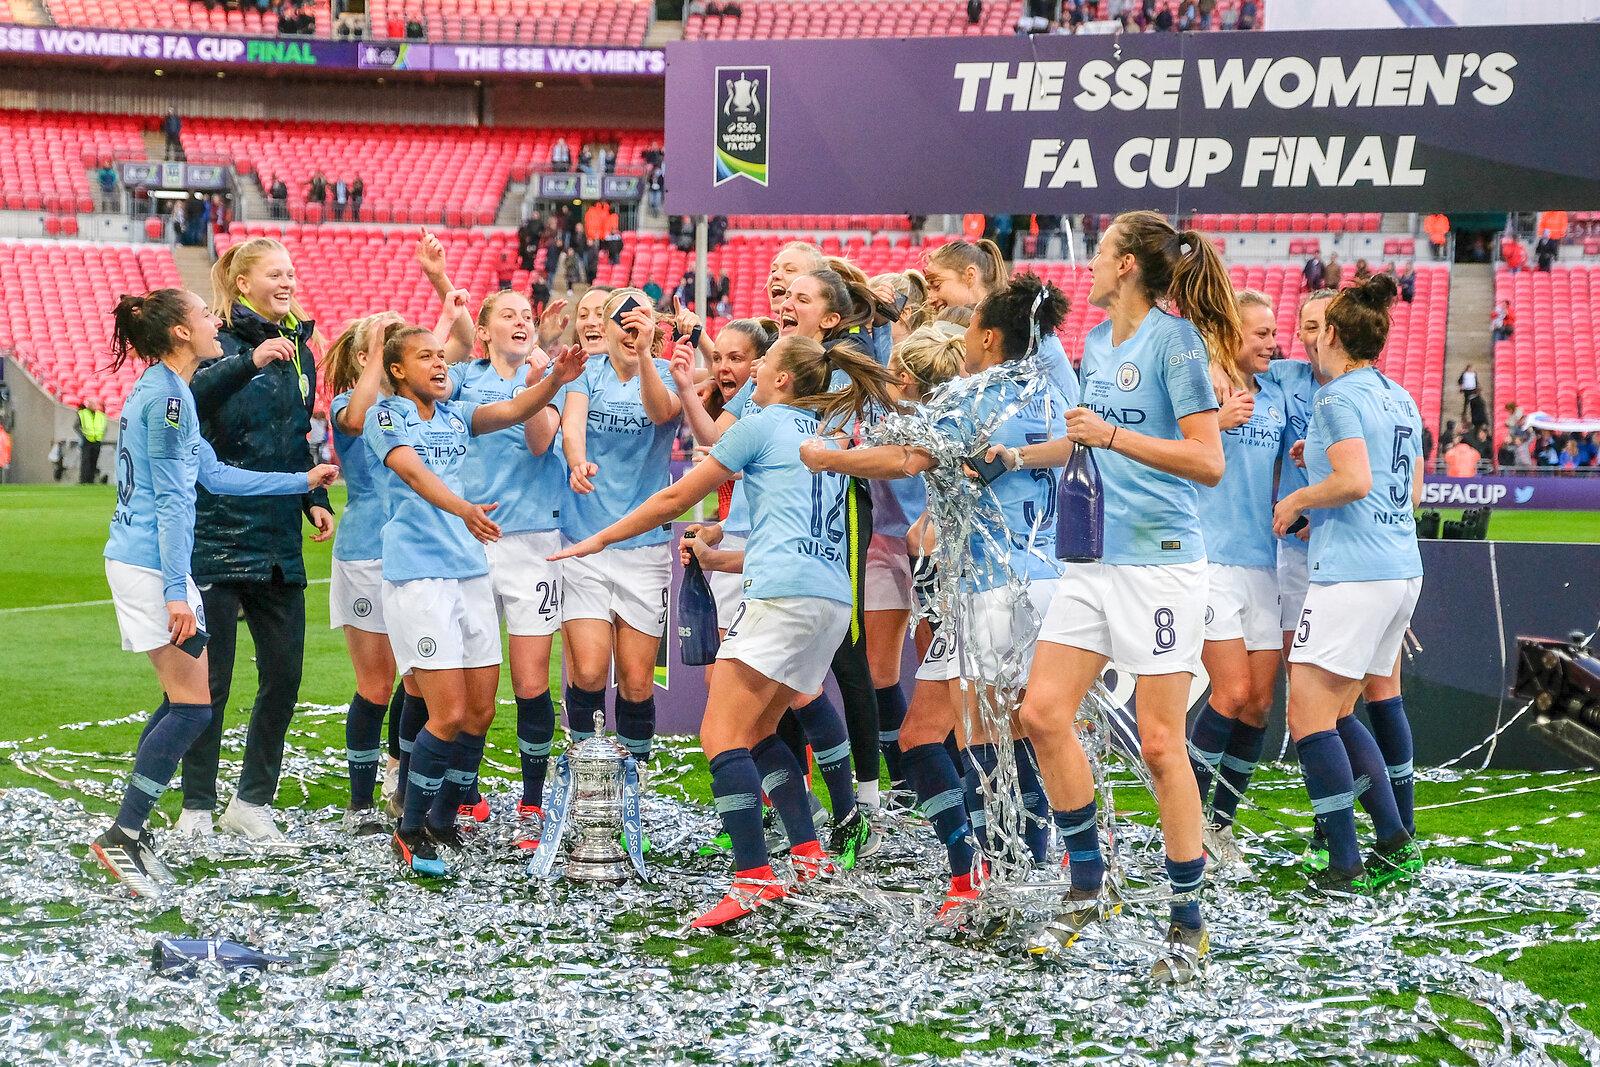 Manchester City Women Vs West Ham United Women